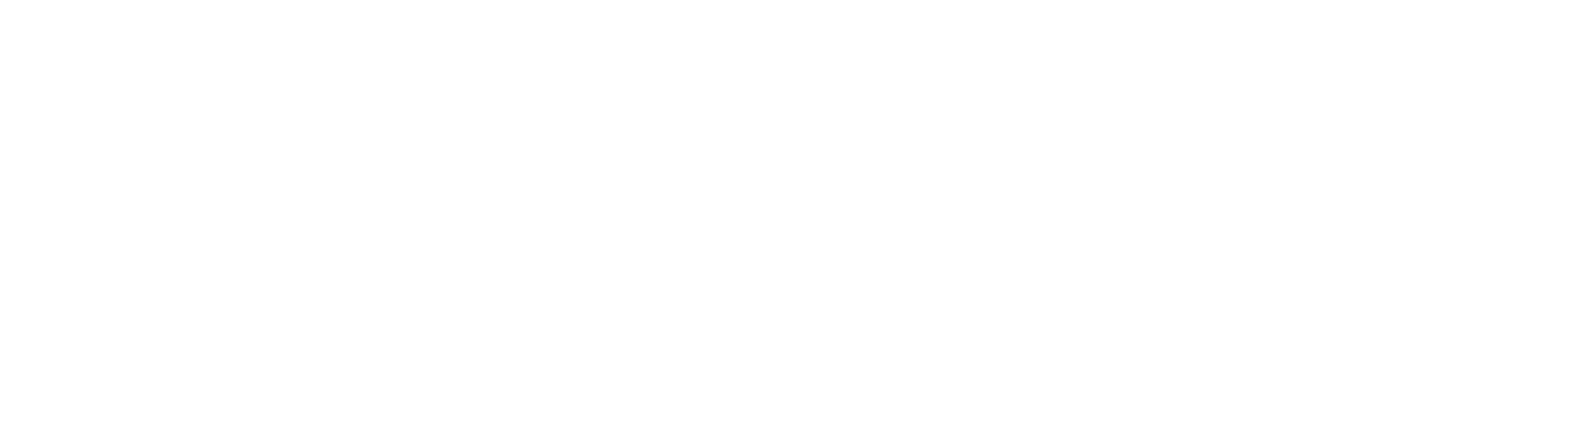 Plzlogin